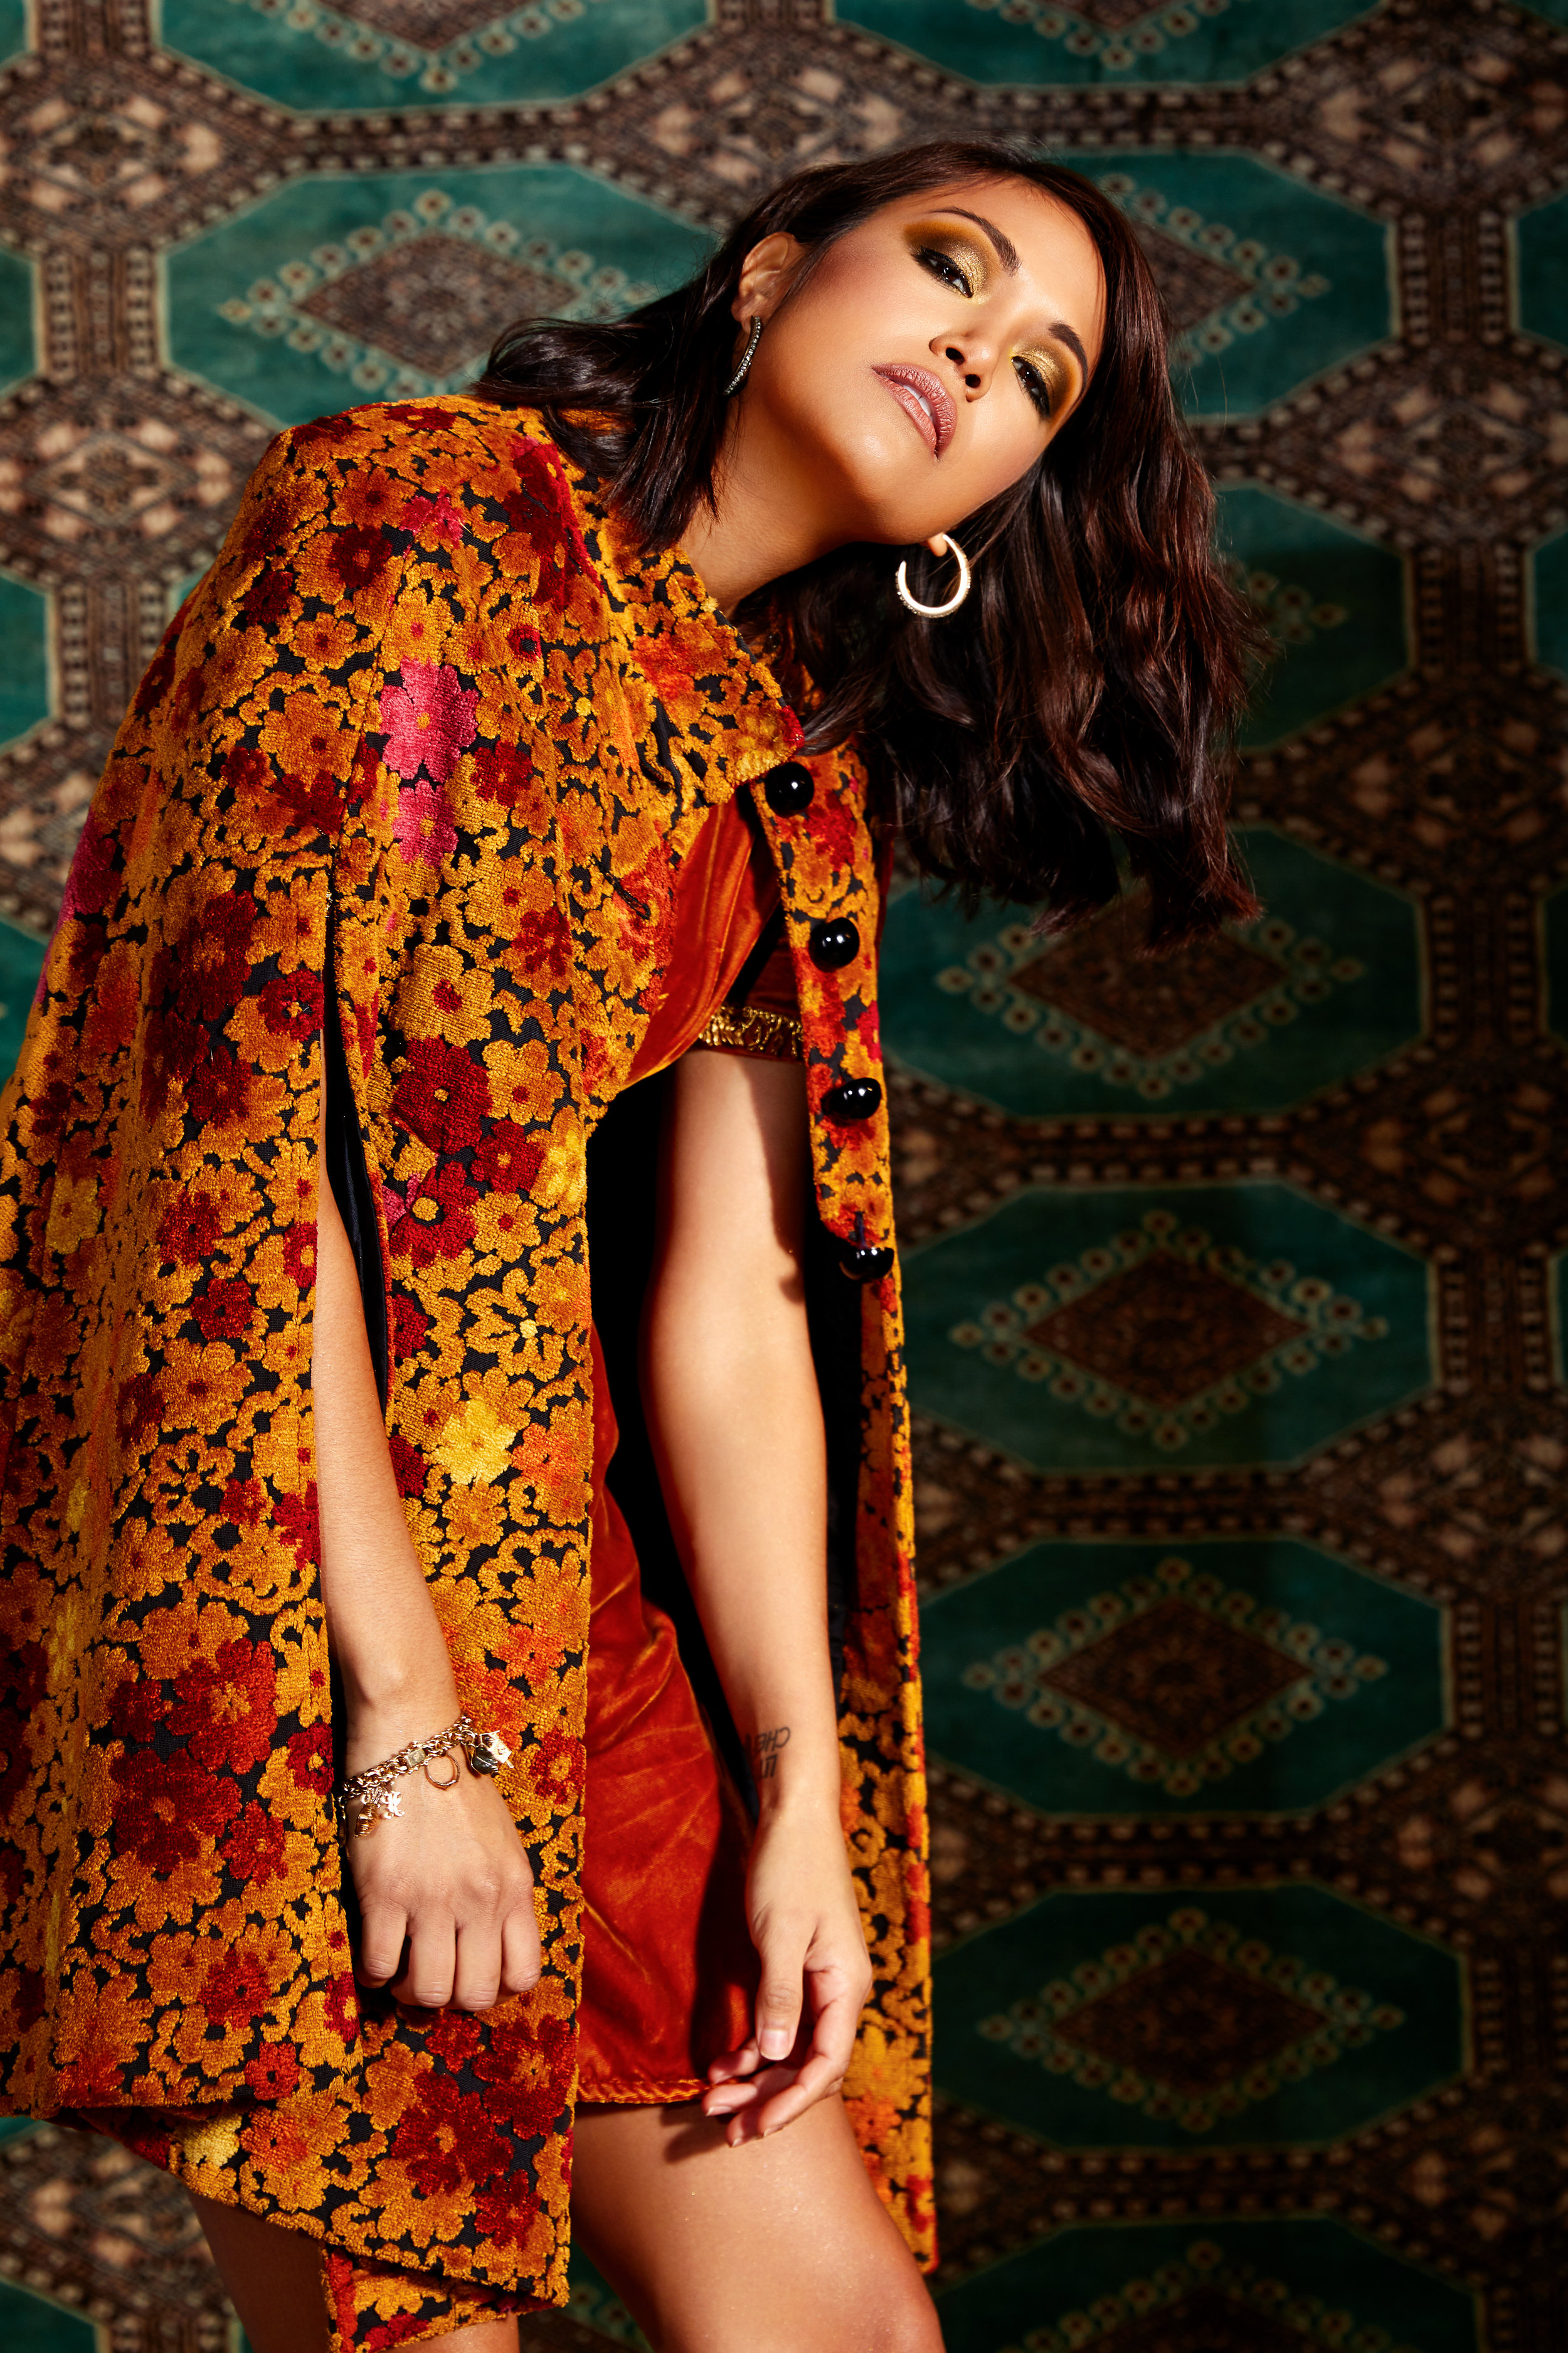 181209_veronica_fashion_test_look1_0320.jpg